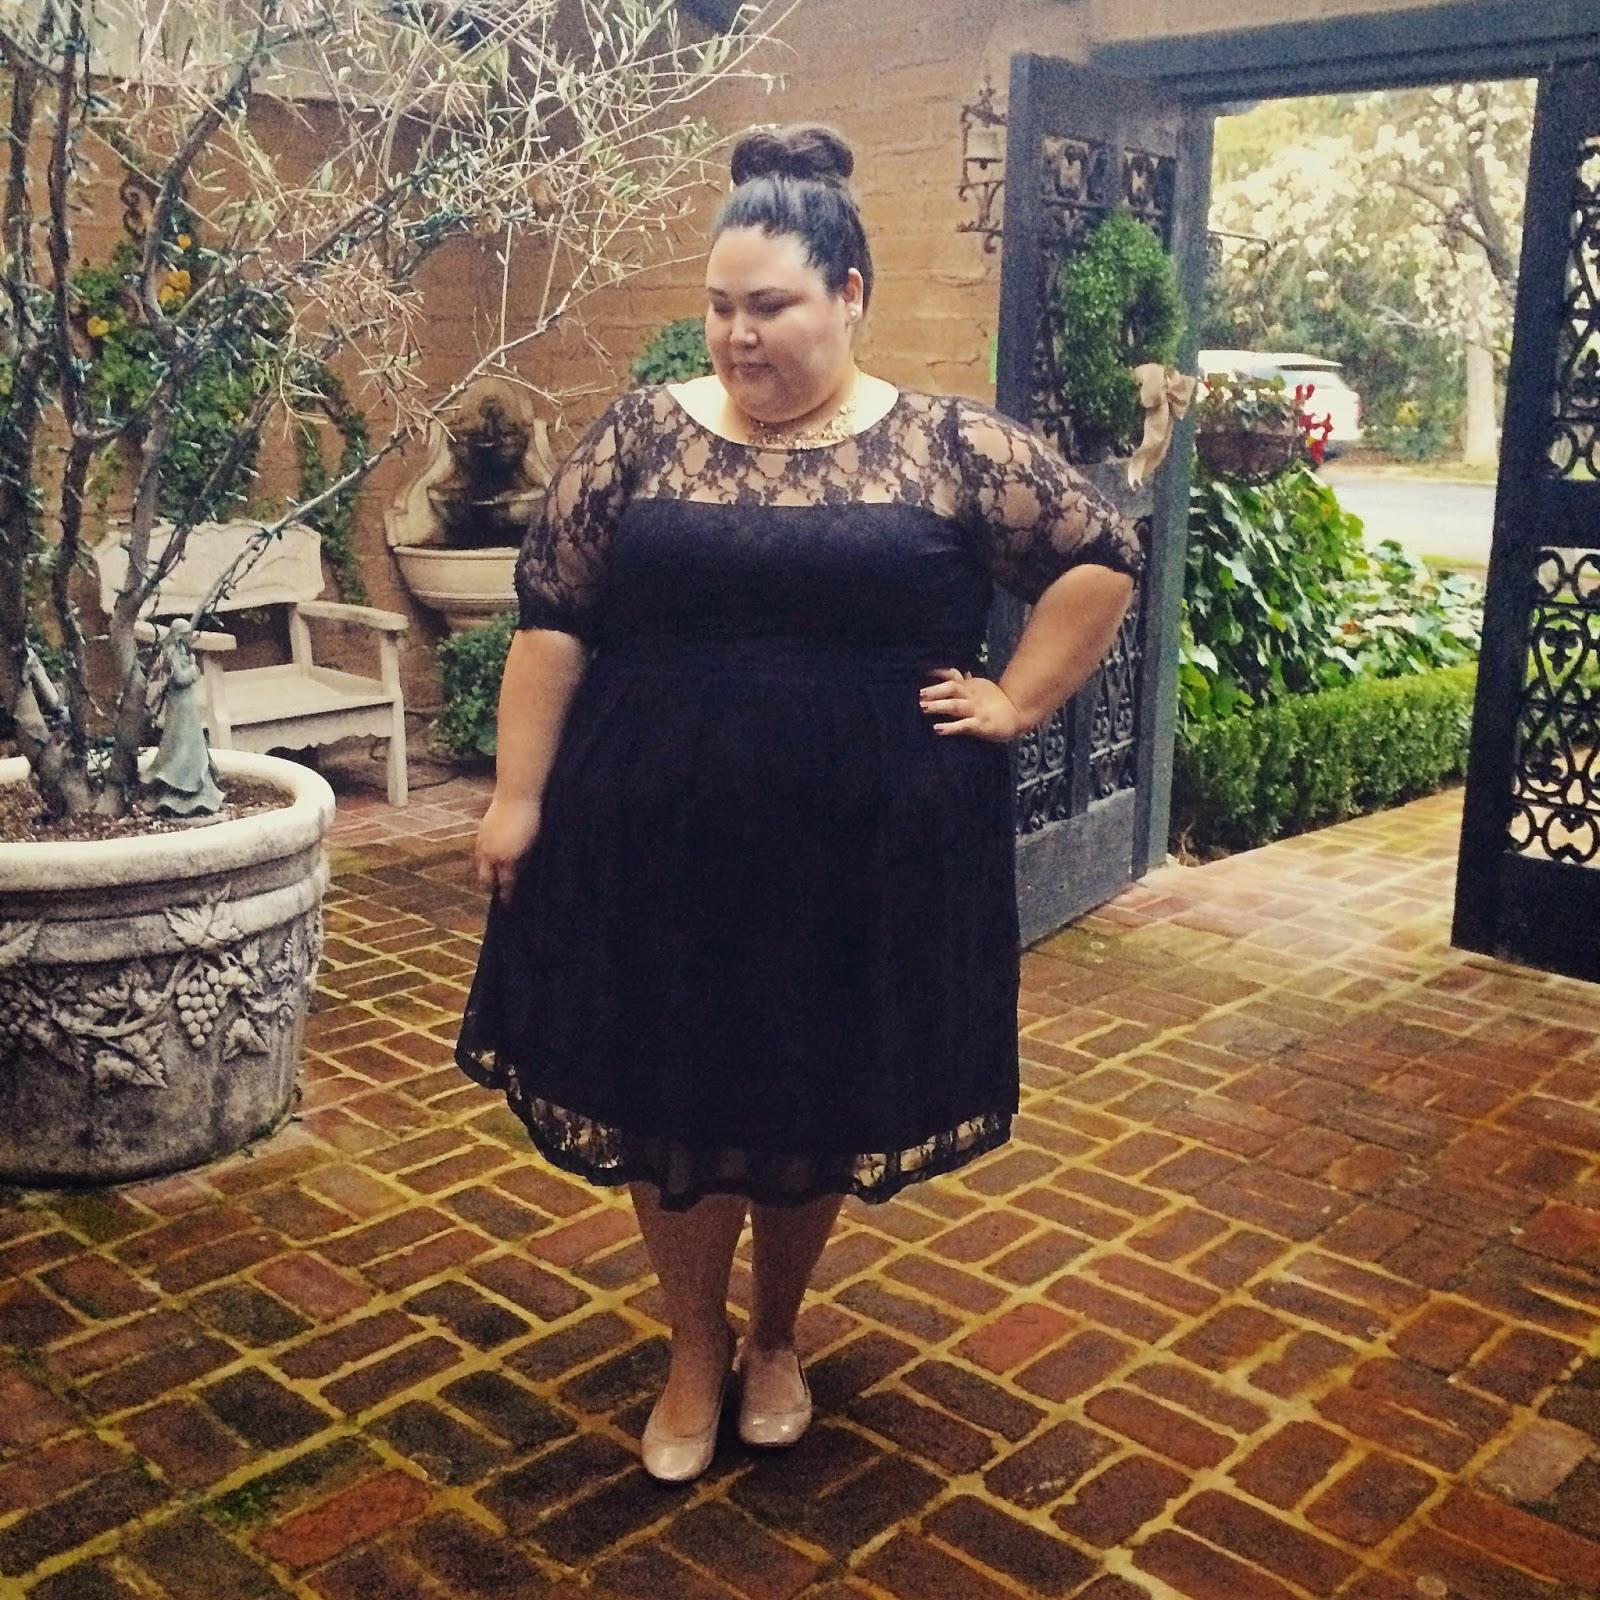 "Foto: Reprodução / <a href=""http://www.fashionloveandmartinis.com/2015/02/kiyonnas-luna-lace-dress-review.html"" target=""_blank"">Fashion Love and Martinis</a>"